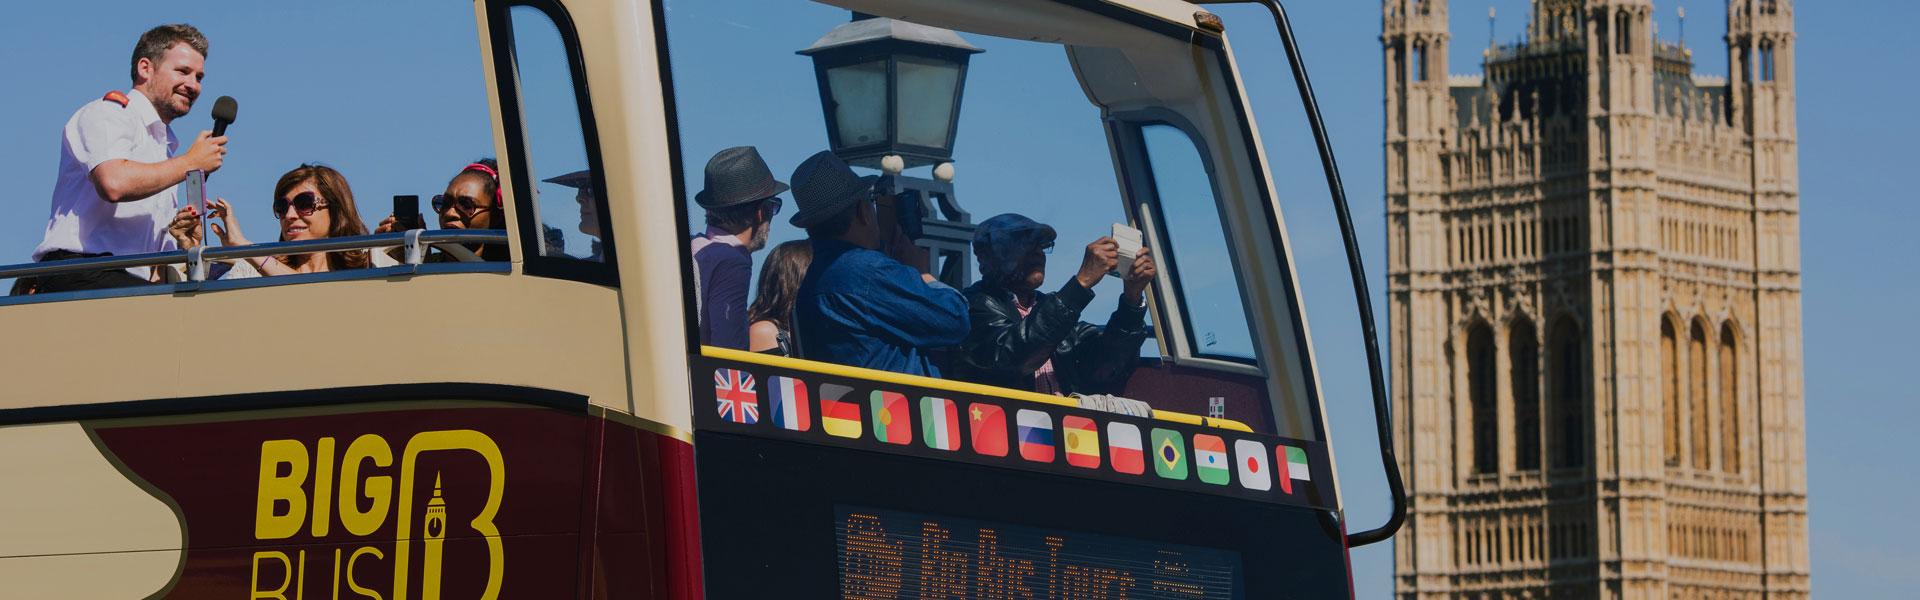 Big Bus open-top tour of London